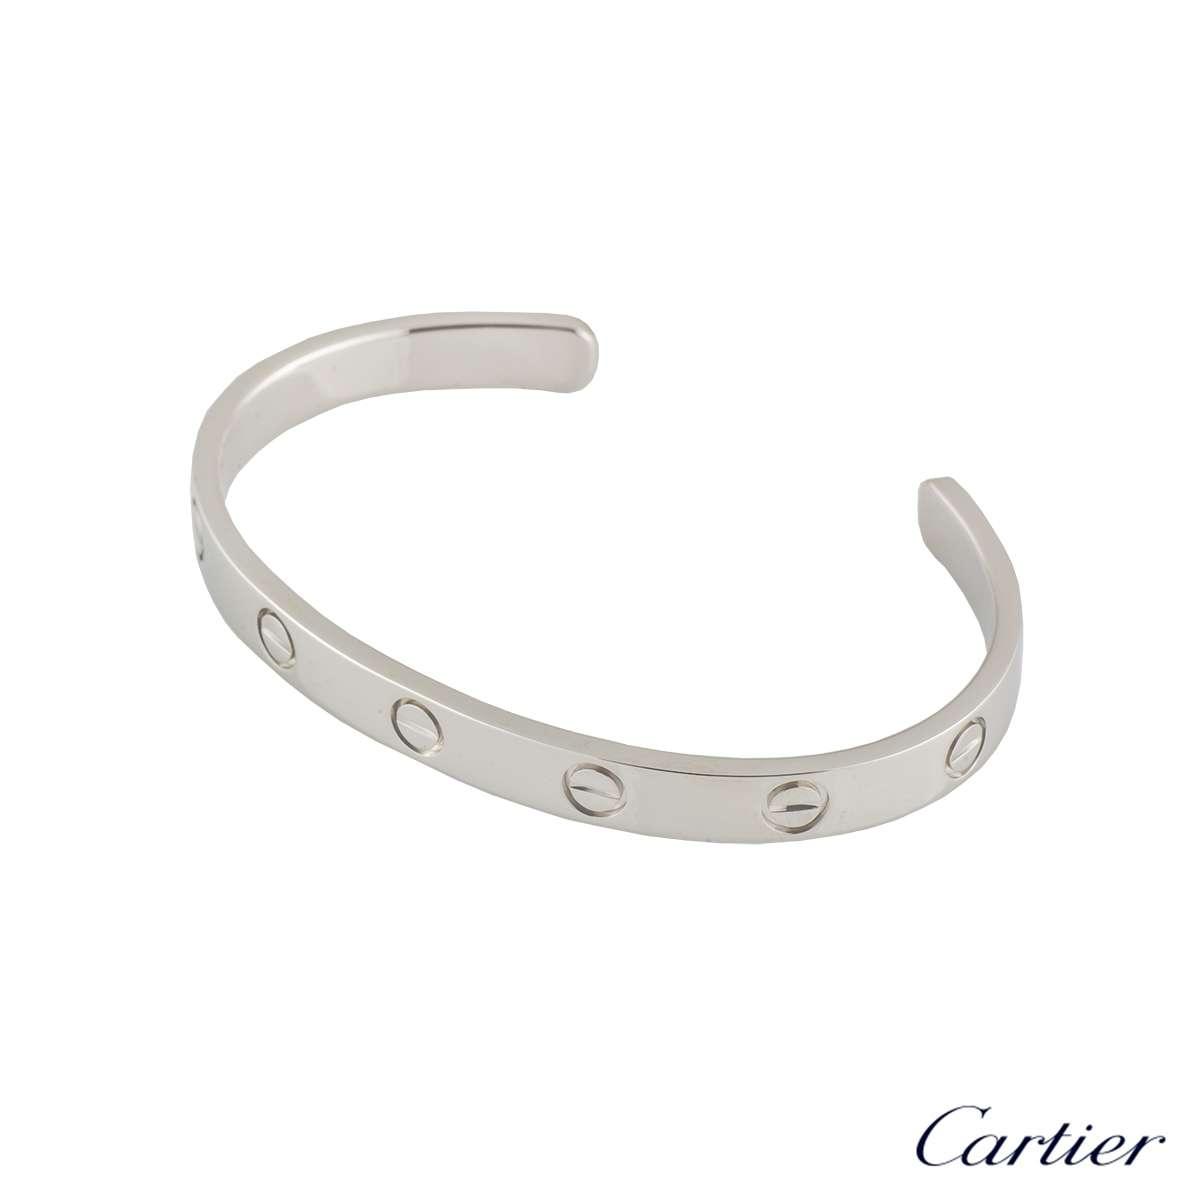 White Gold Cuff Bracelet: Cartier 18k White Gold Love Cuff Bracelet Size 16 B6032516